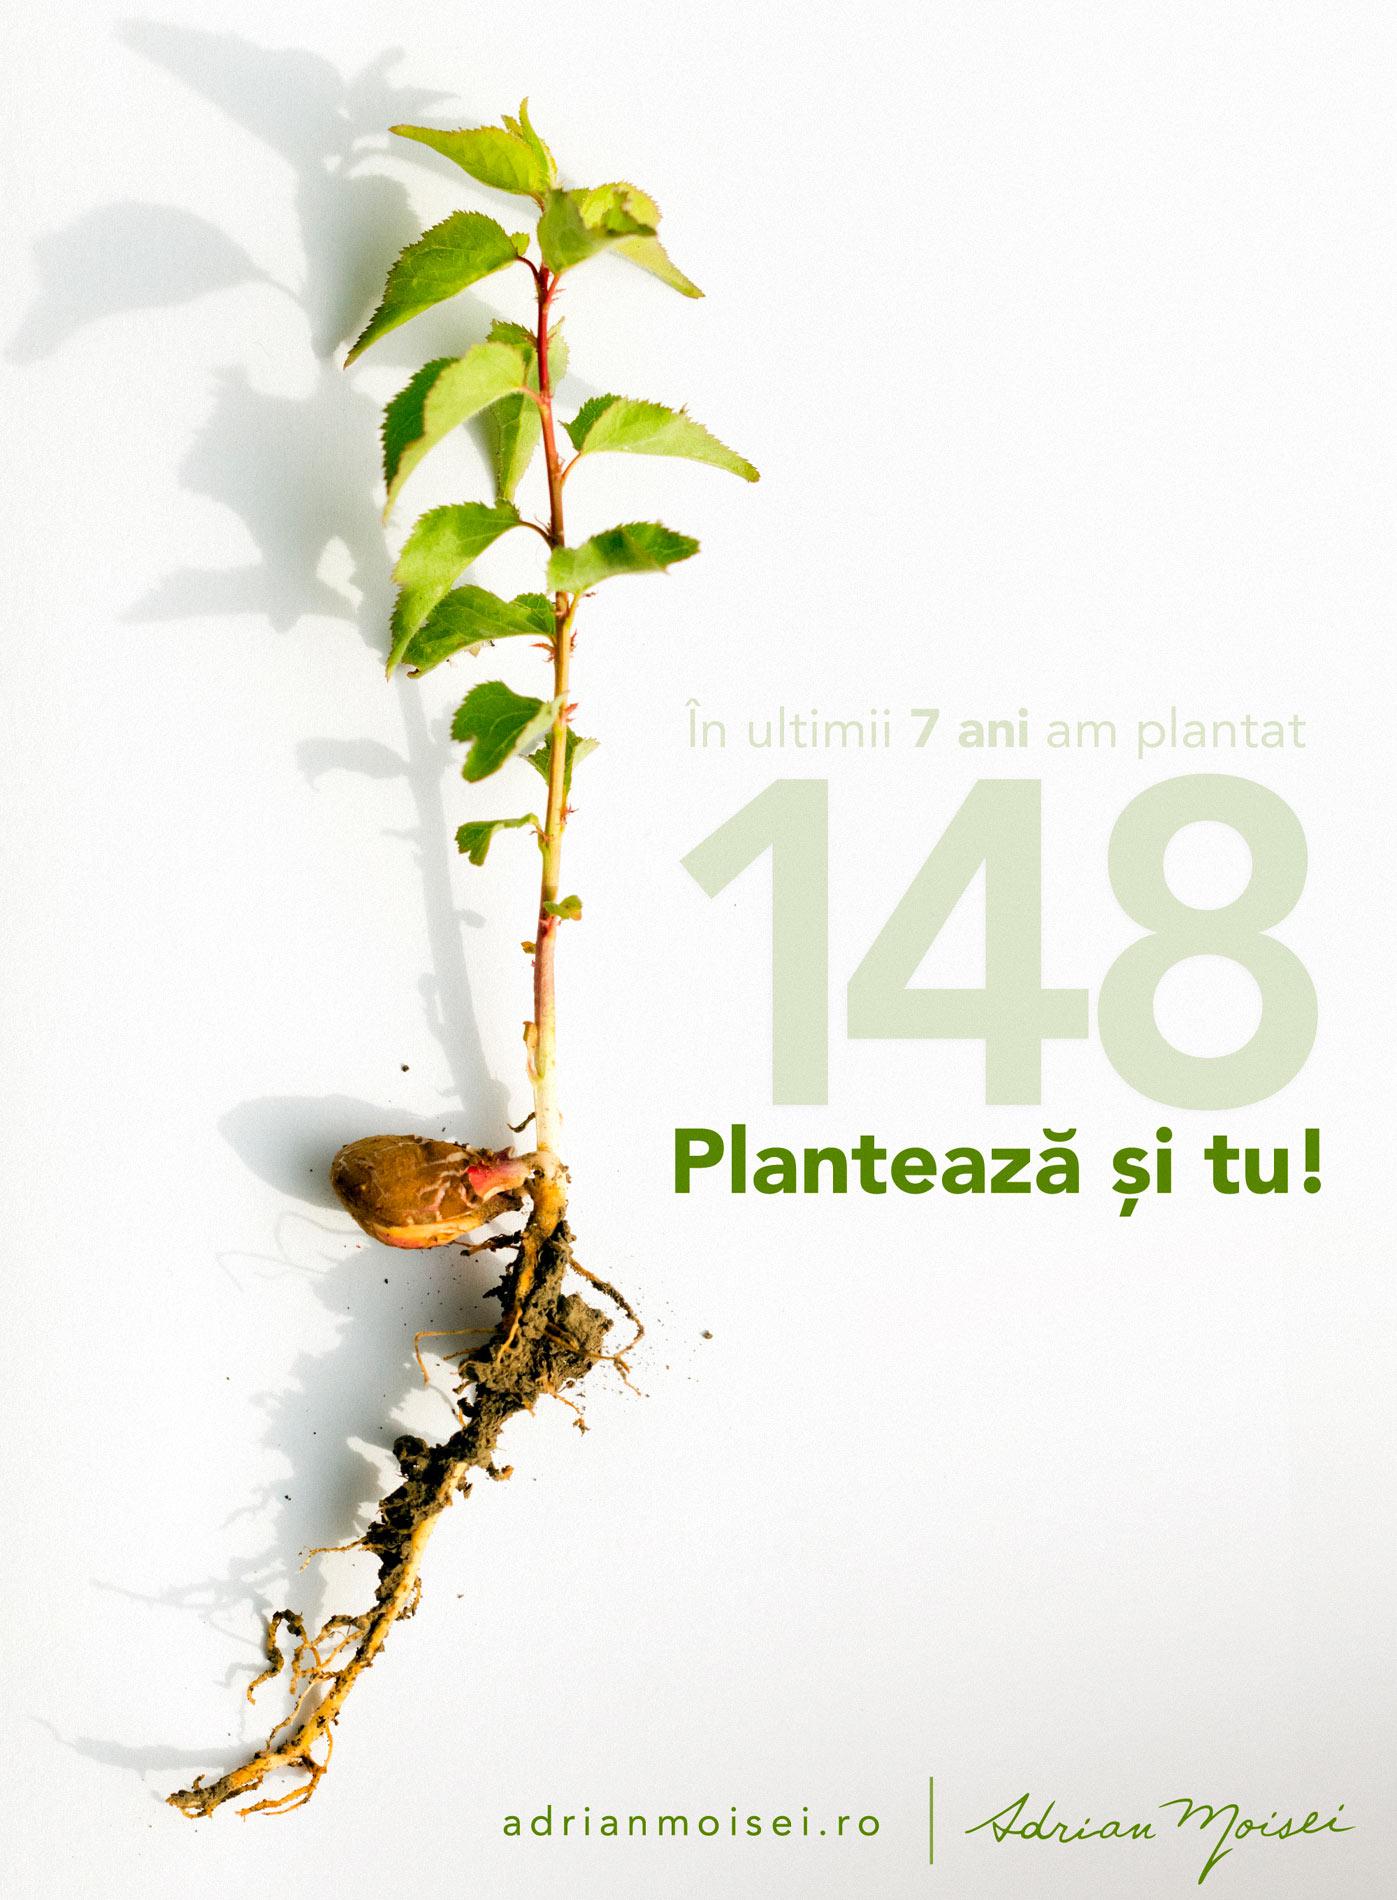 Planteaza si tu copaci